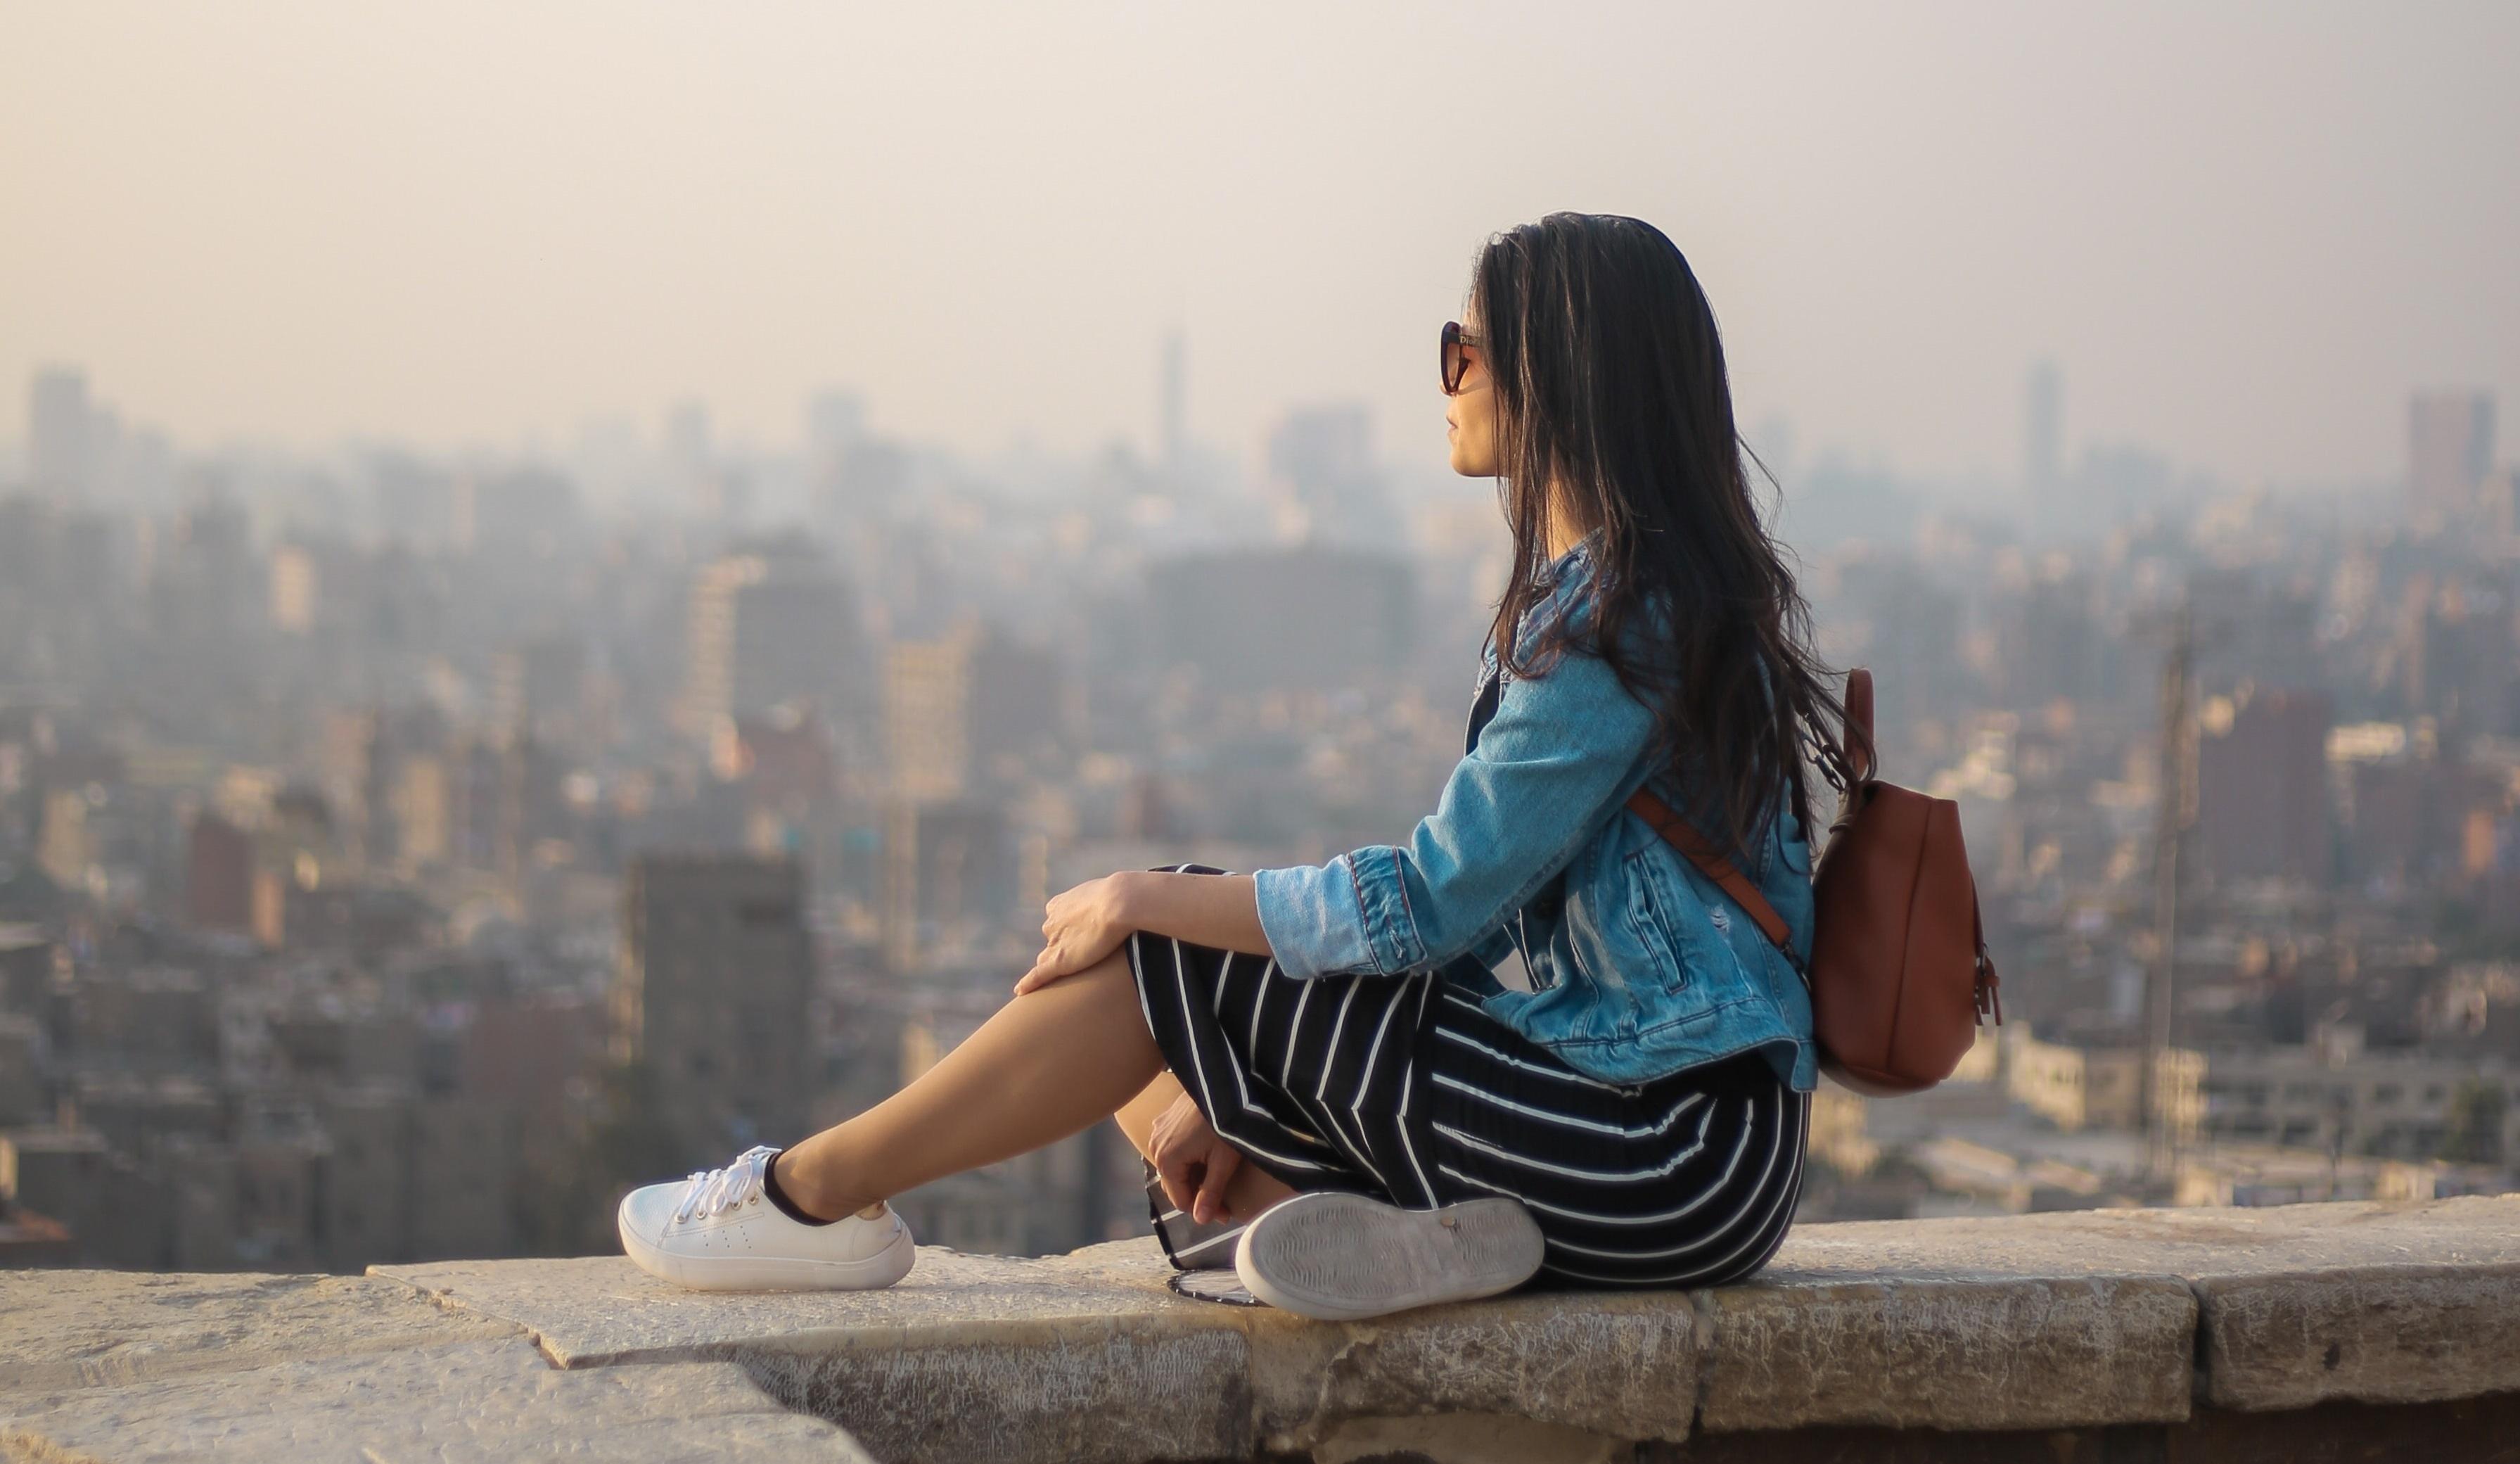 Gaba reduce simptomele de depresie, anxietate și insomnie